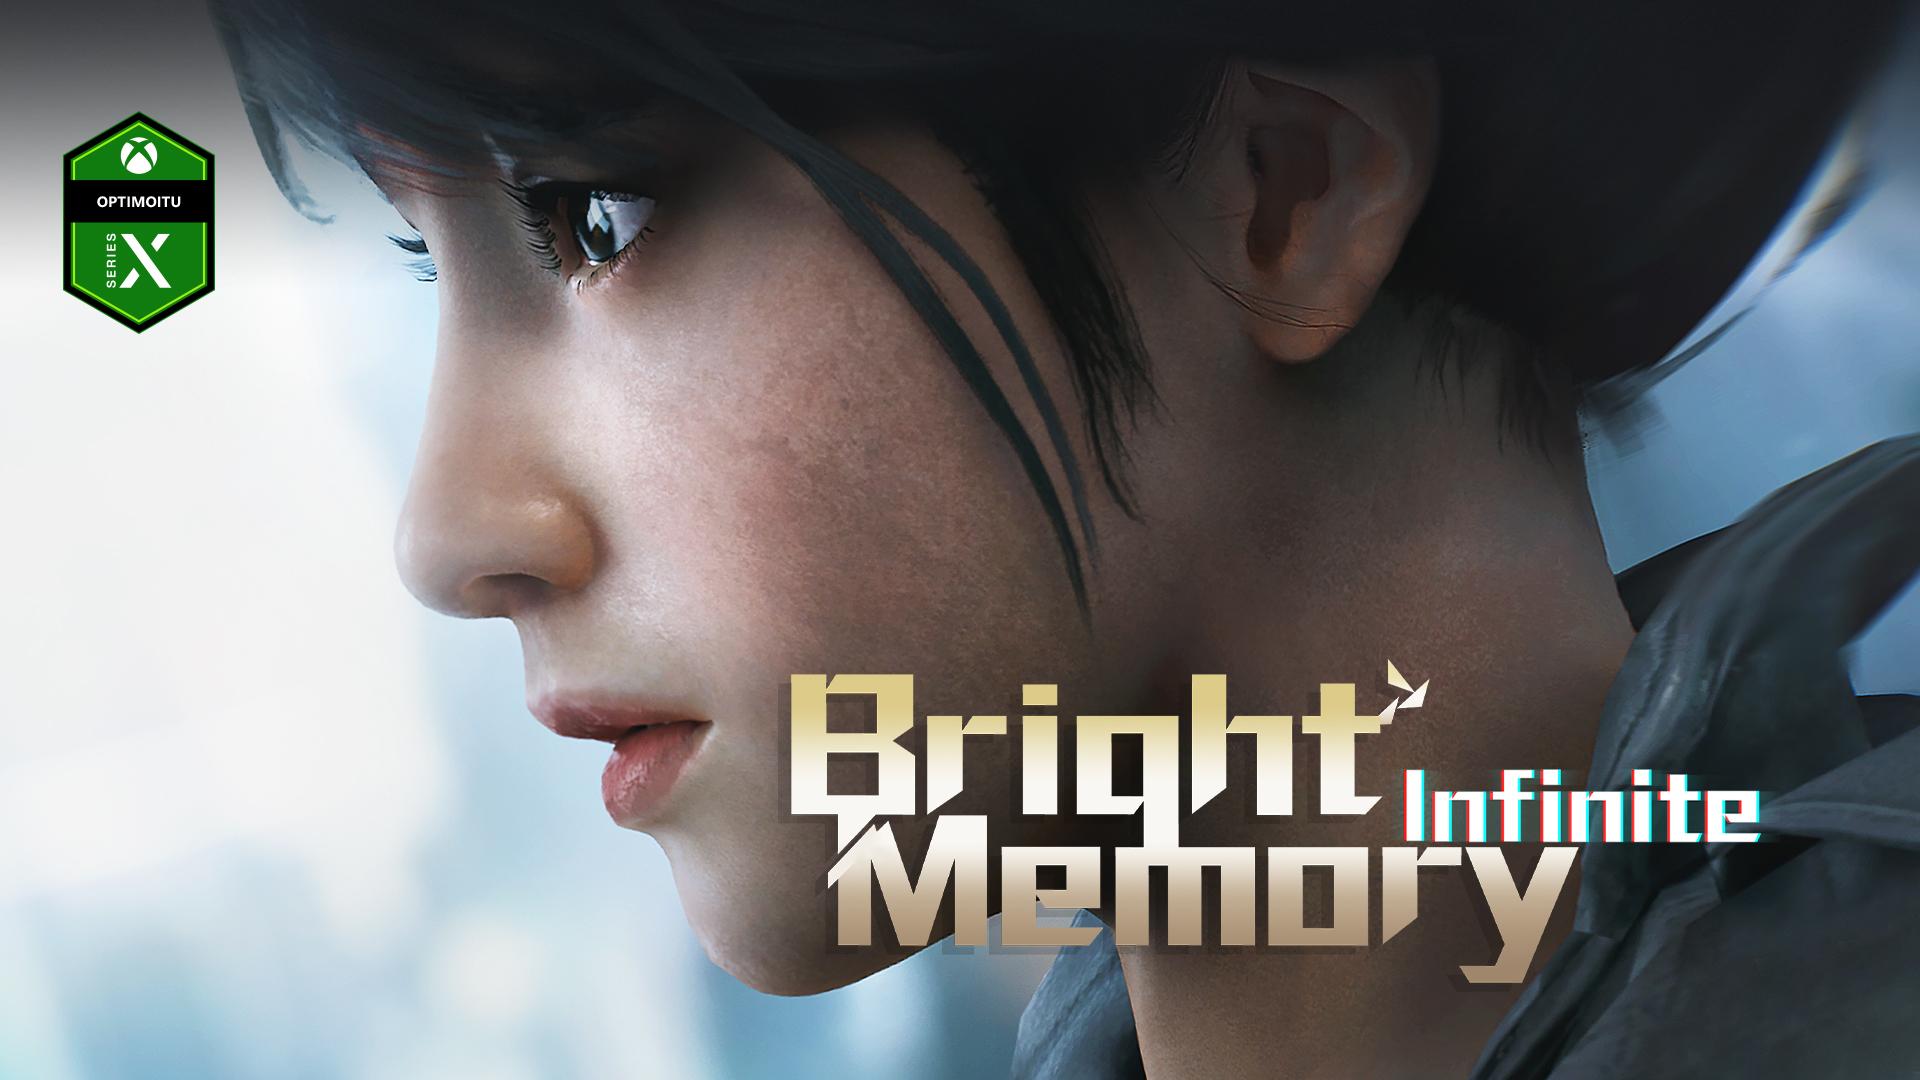 Bright Memory Infinite, optimoitu Series X:lle, nuori nainen katsoo kaukaisuuteen.